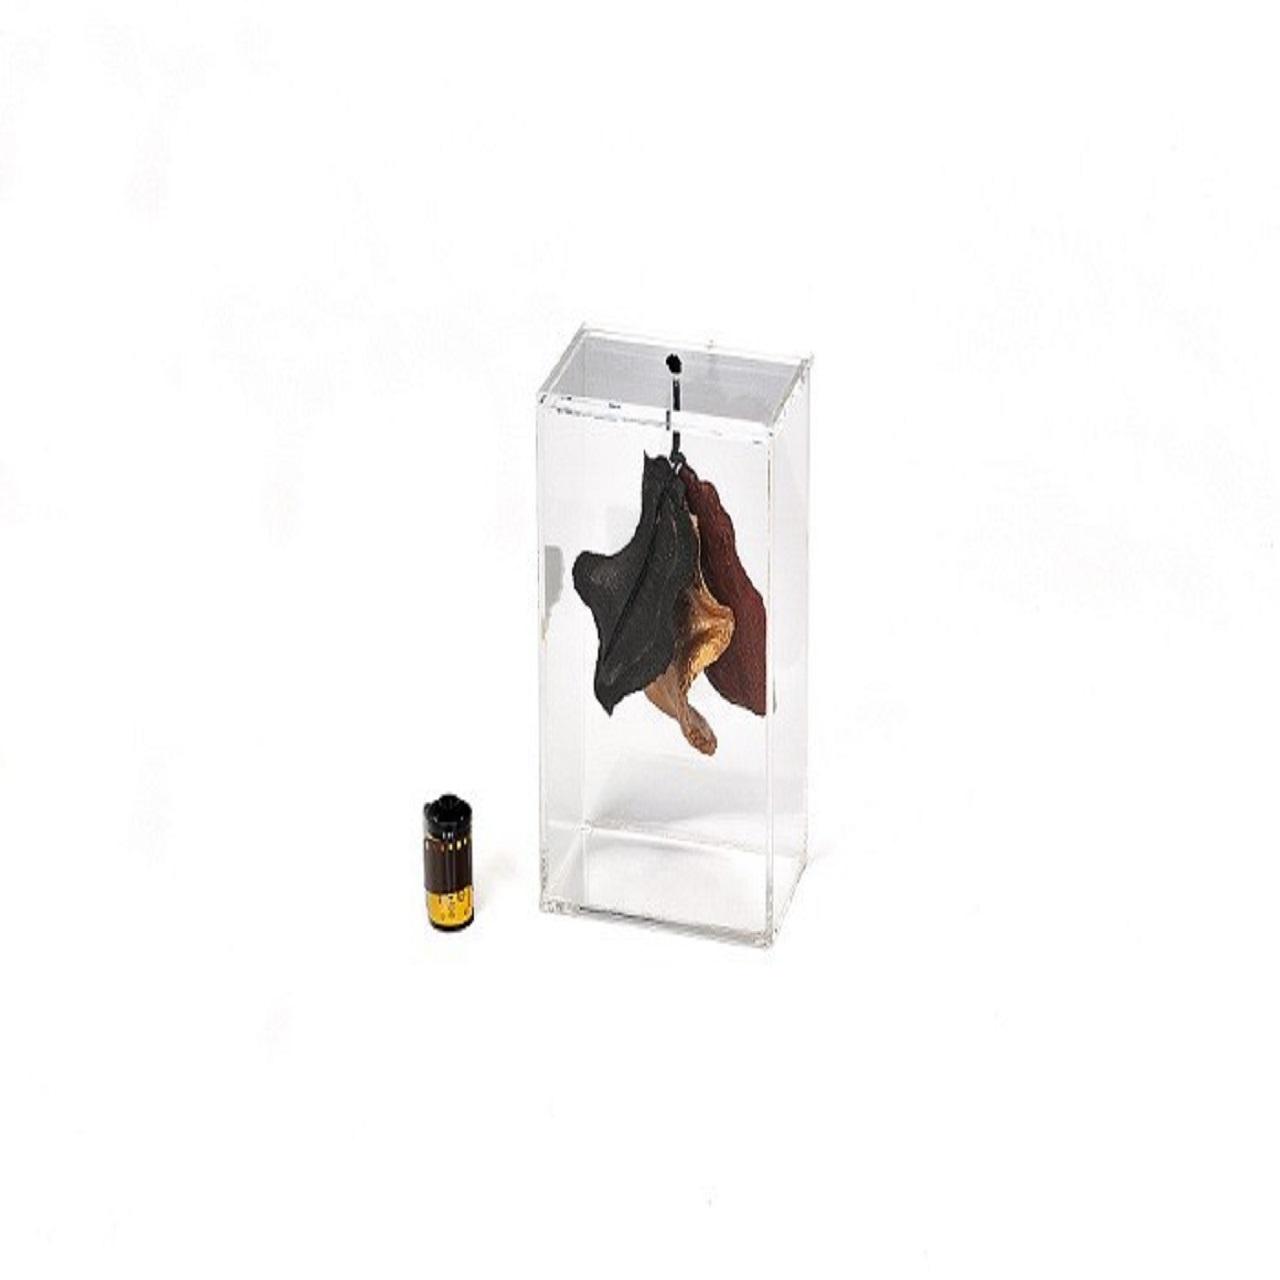 Caixa P Boca de Sapo | preta, colorida e laranja